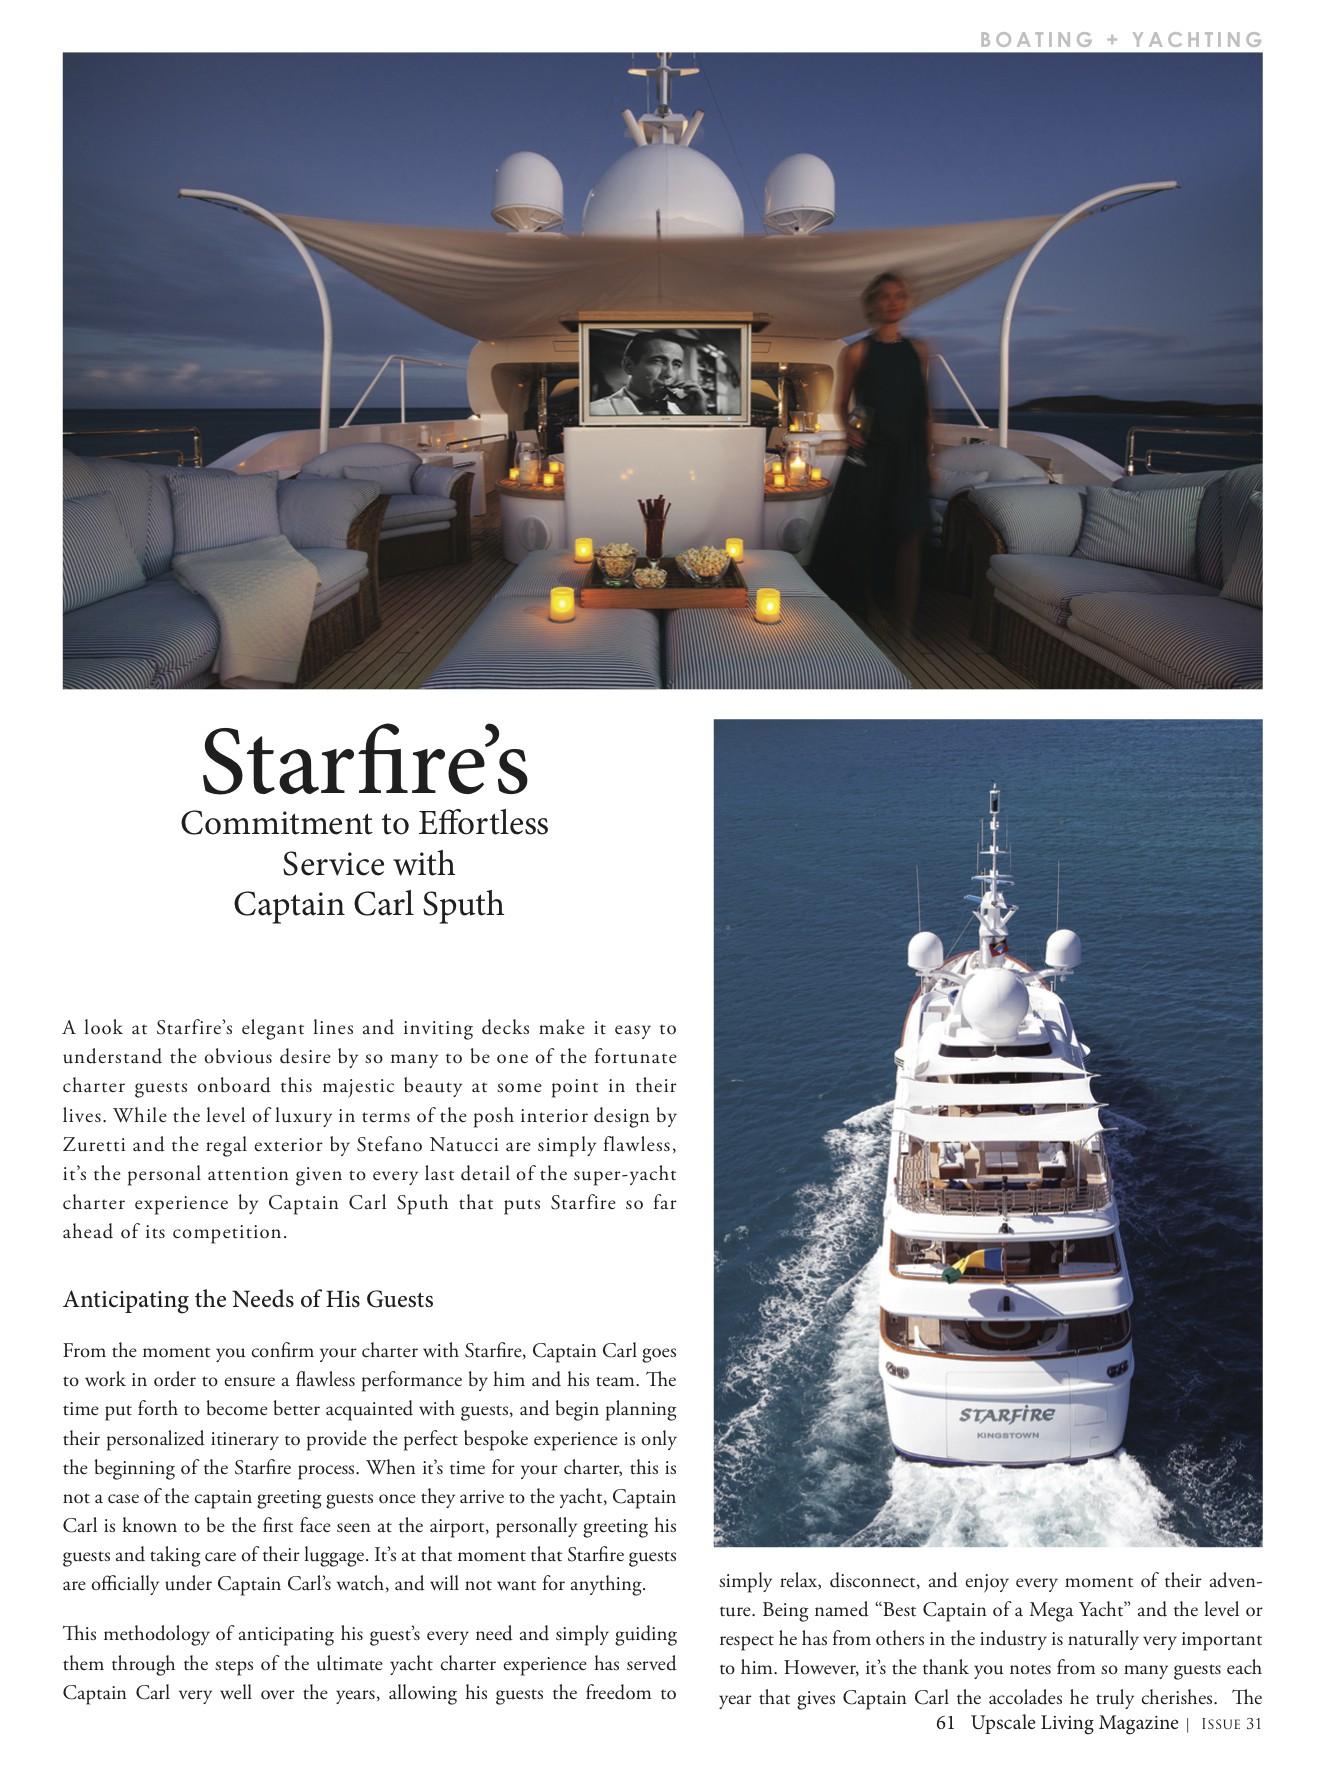 ULM_DamonMBanks_Yacht_2